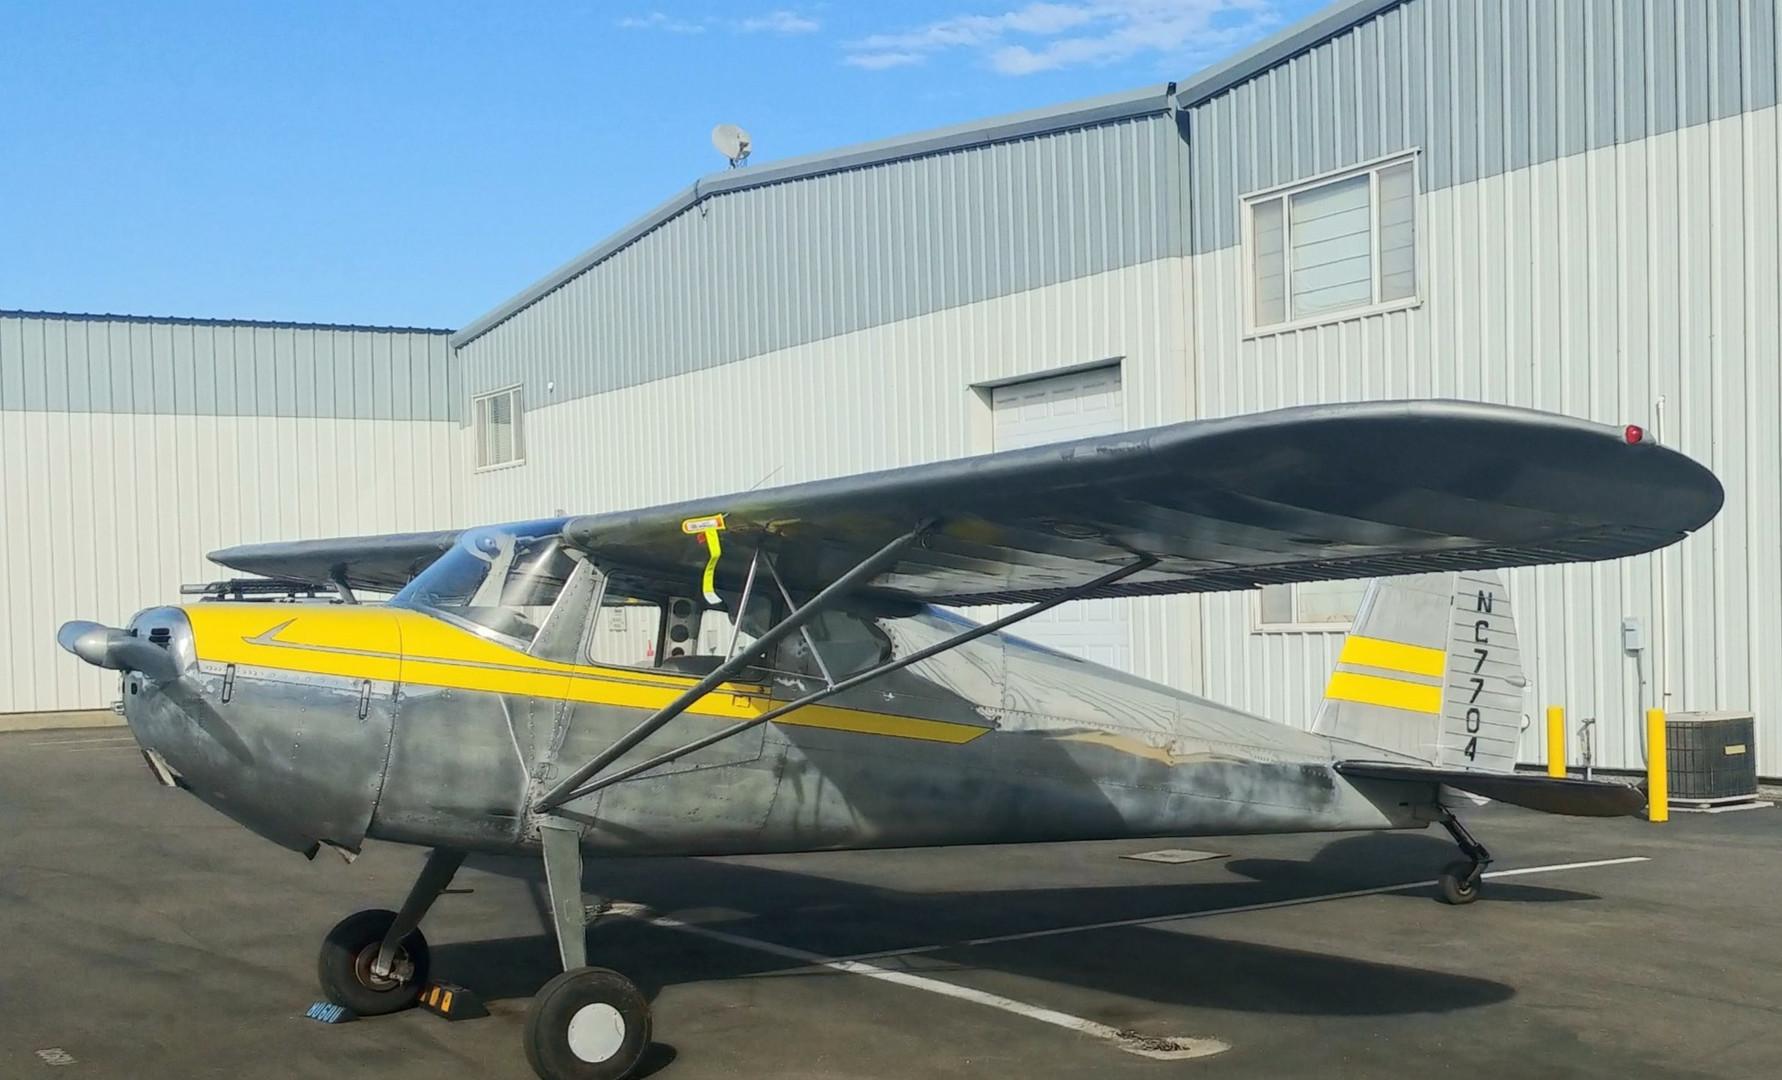 Cessna 140 Tailwheel Training Endorsement